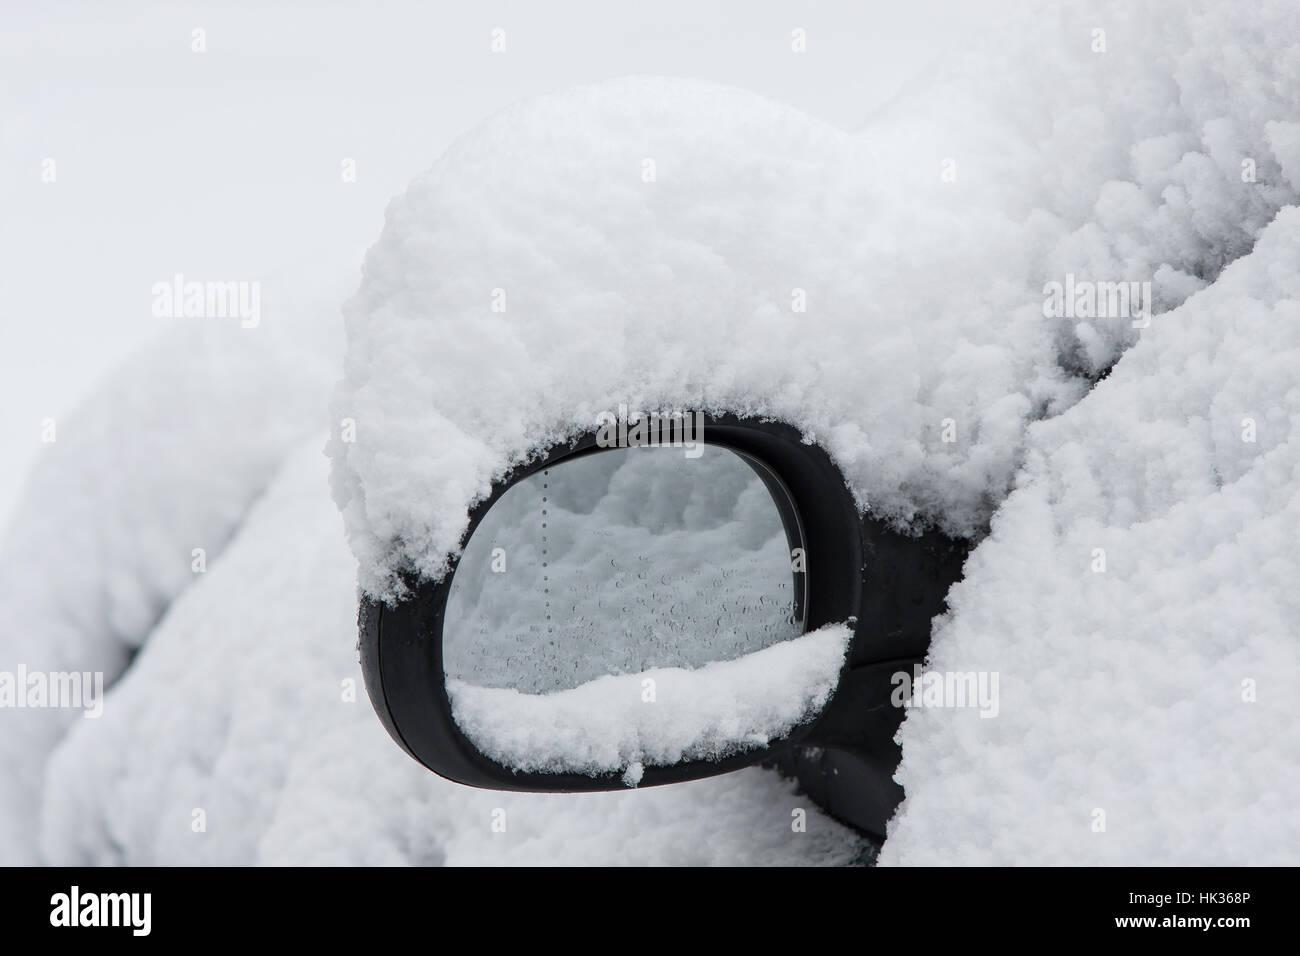 Snowy car mirror - Stock Image